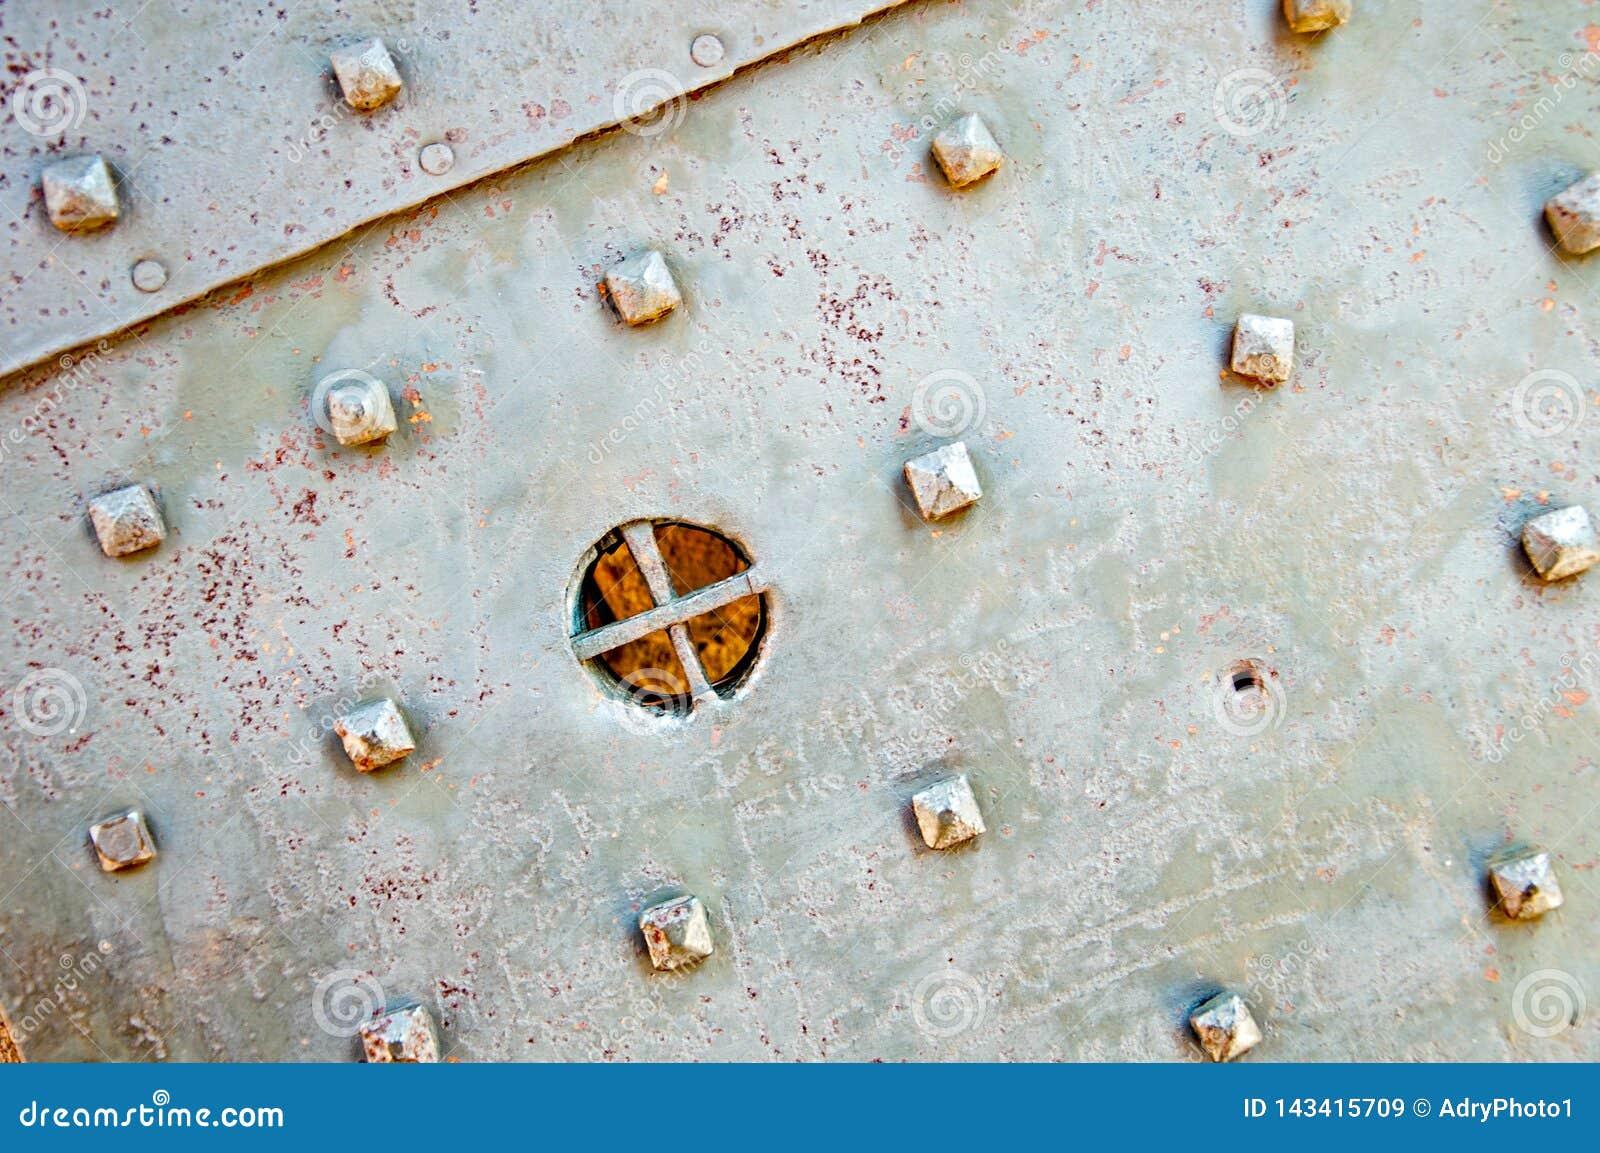 Dozza Италия: Старая деталь двери замка